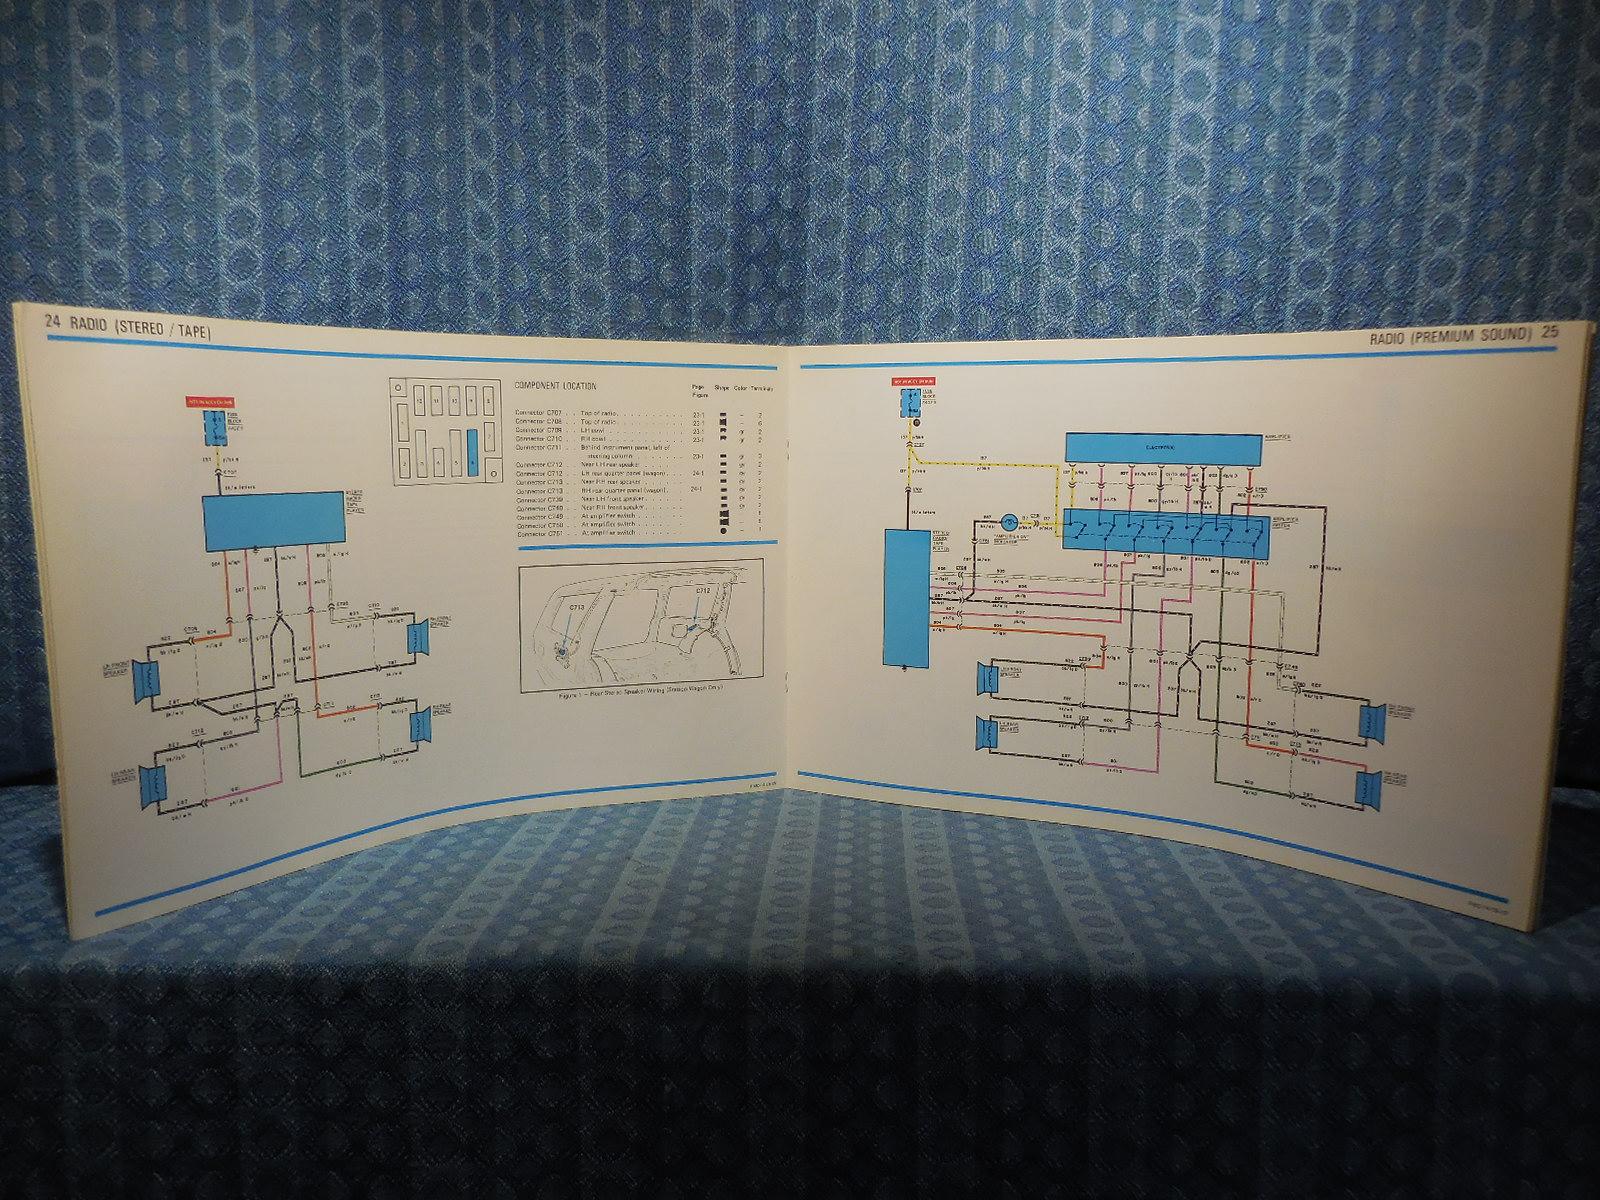 Zexel Pump Manual 1981 Yamaha Sr250 Wiring Diagram U003dh104205317 Array Ac Ebook Rh Geologix Solutions